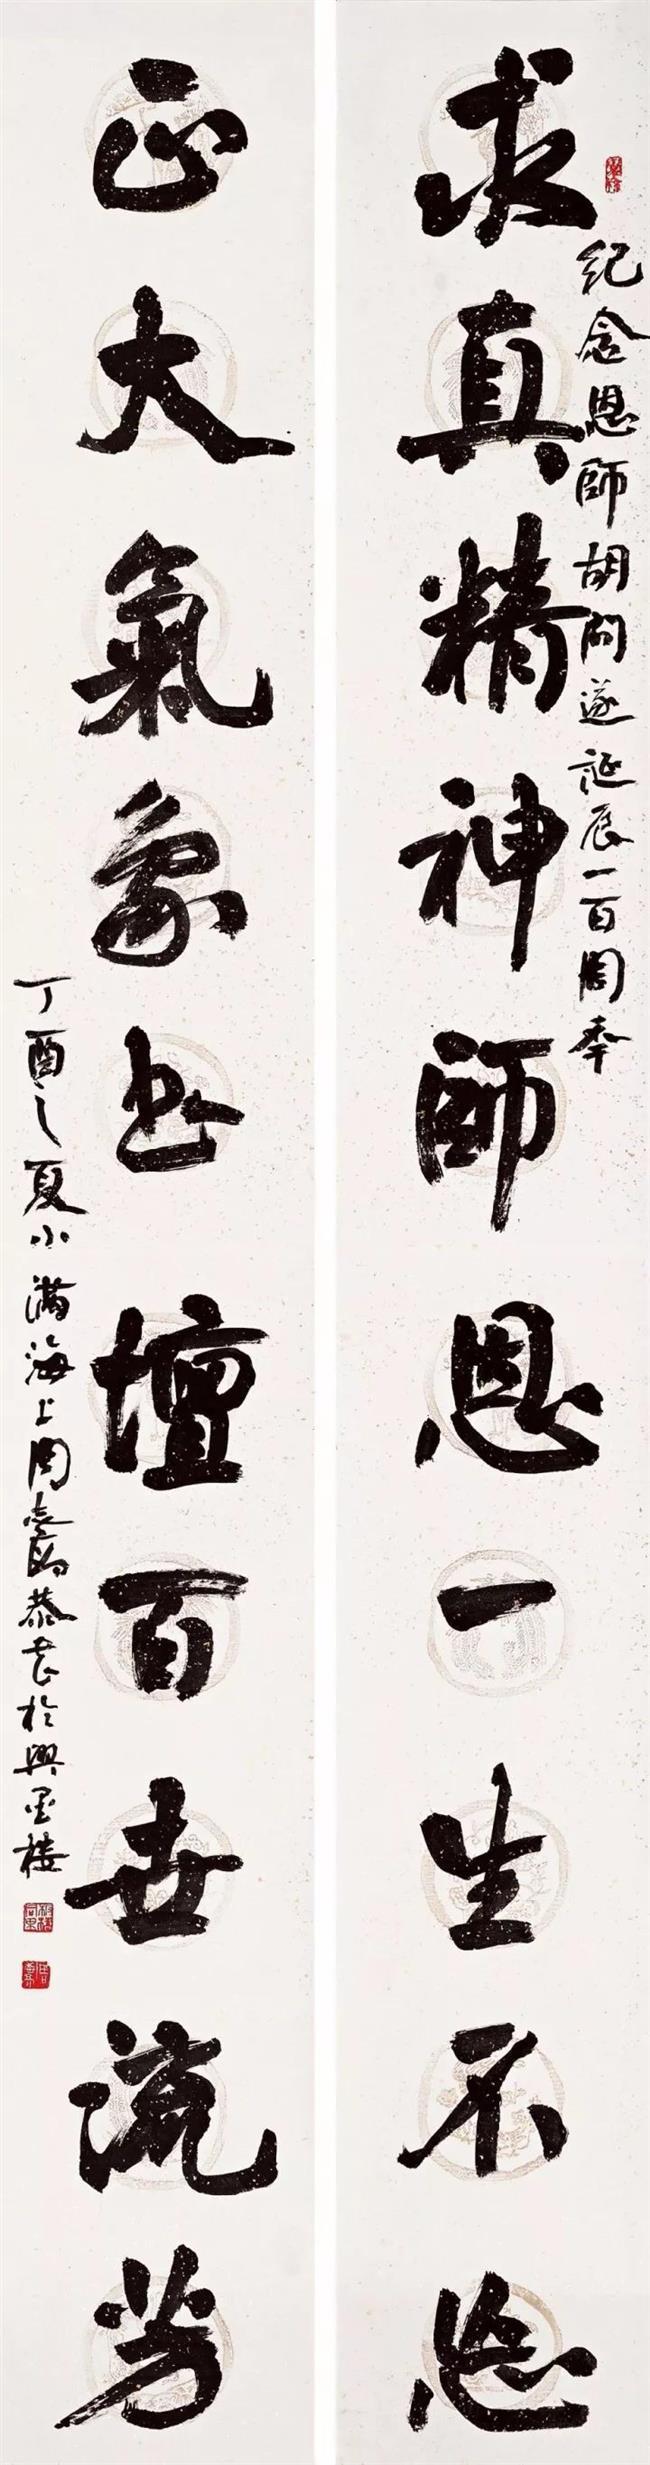 Exhibition celebrates centenary birthday of China's calligraphy master